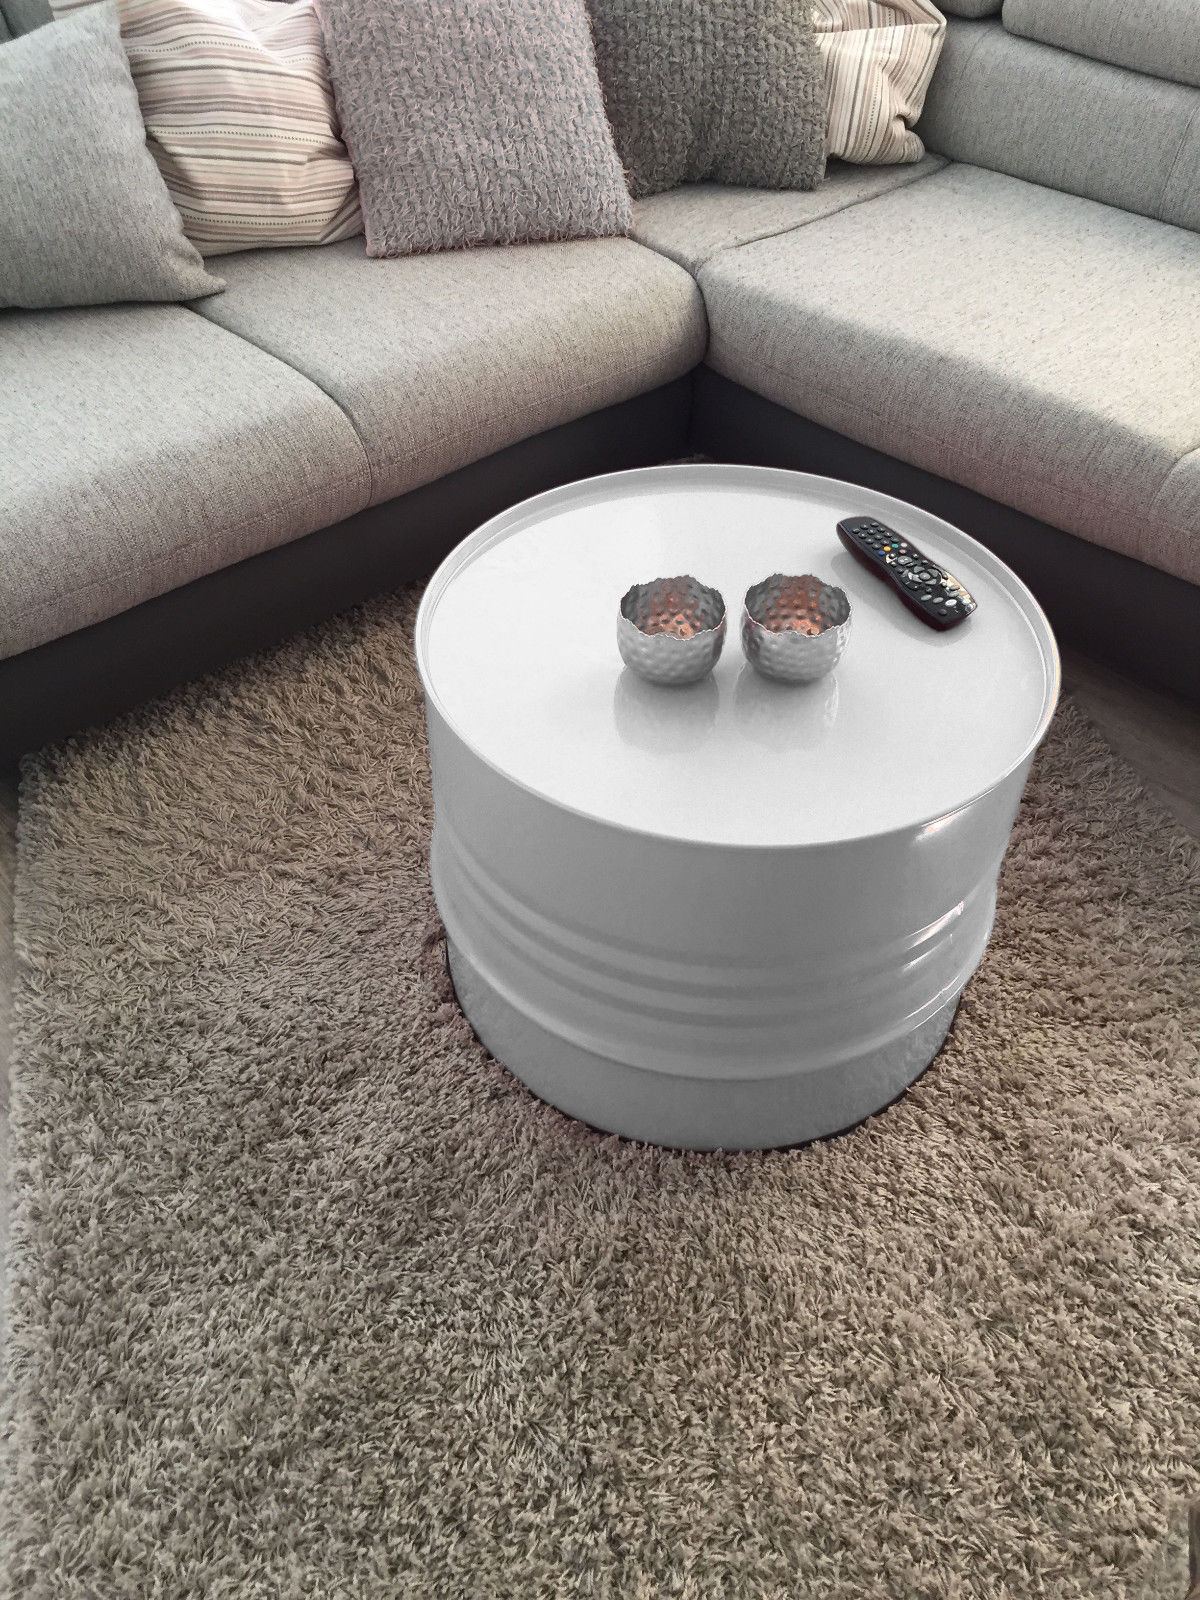 fassmobel beistelltisch tisch fass design mobel couchtisch grau o 57cm